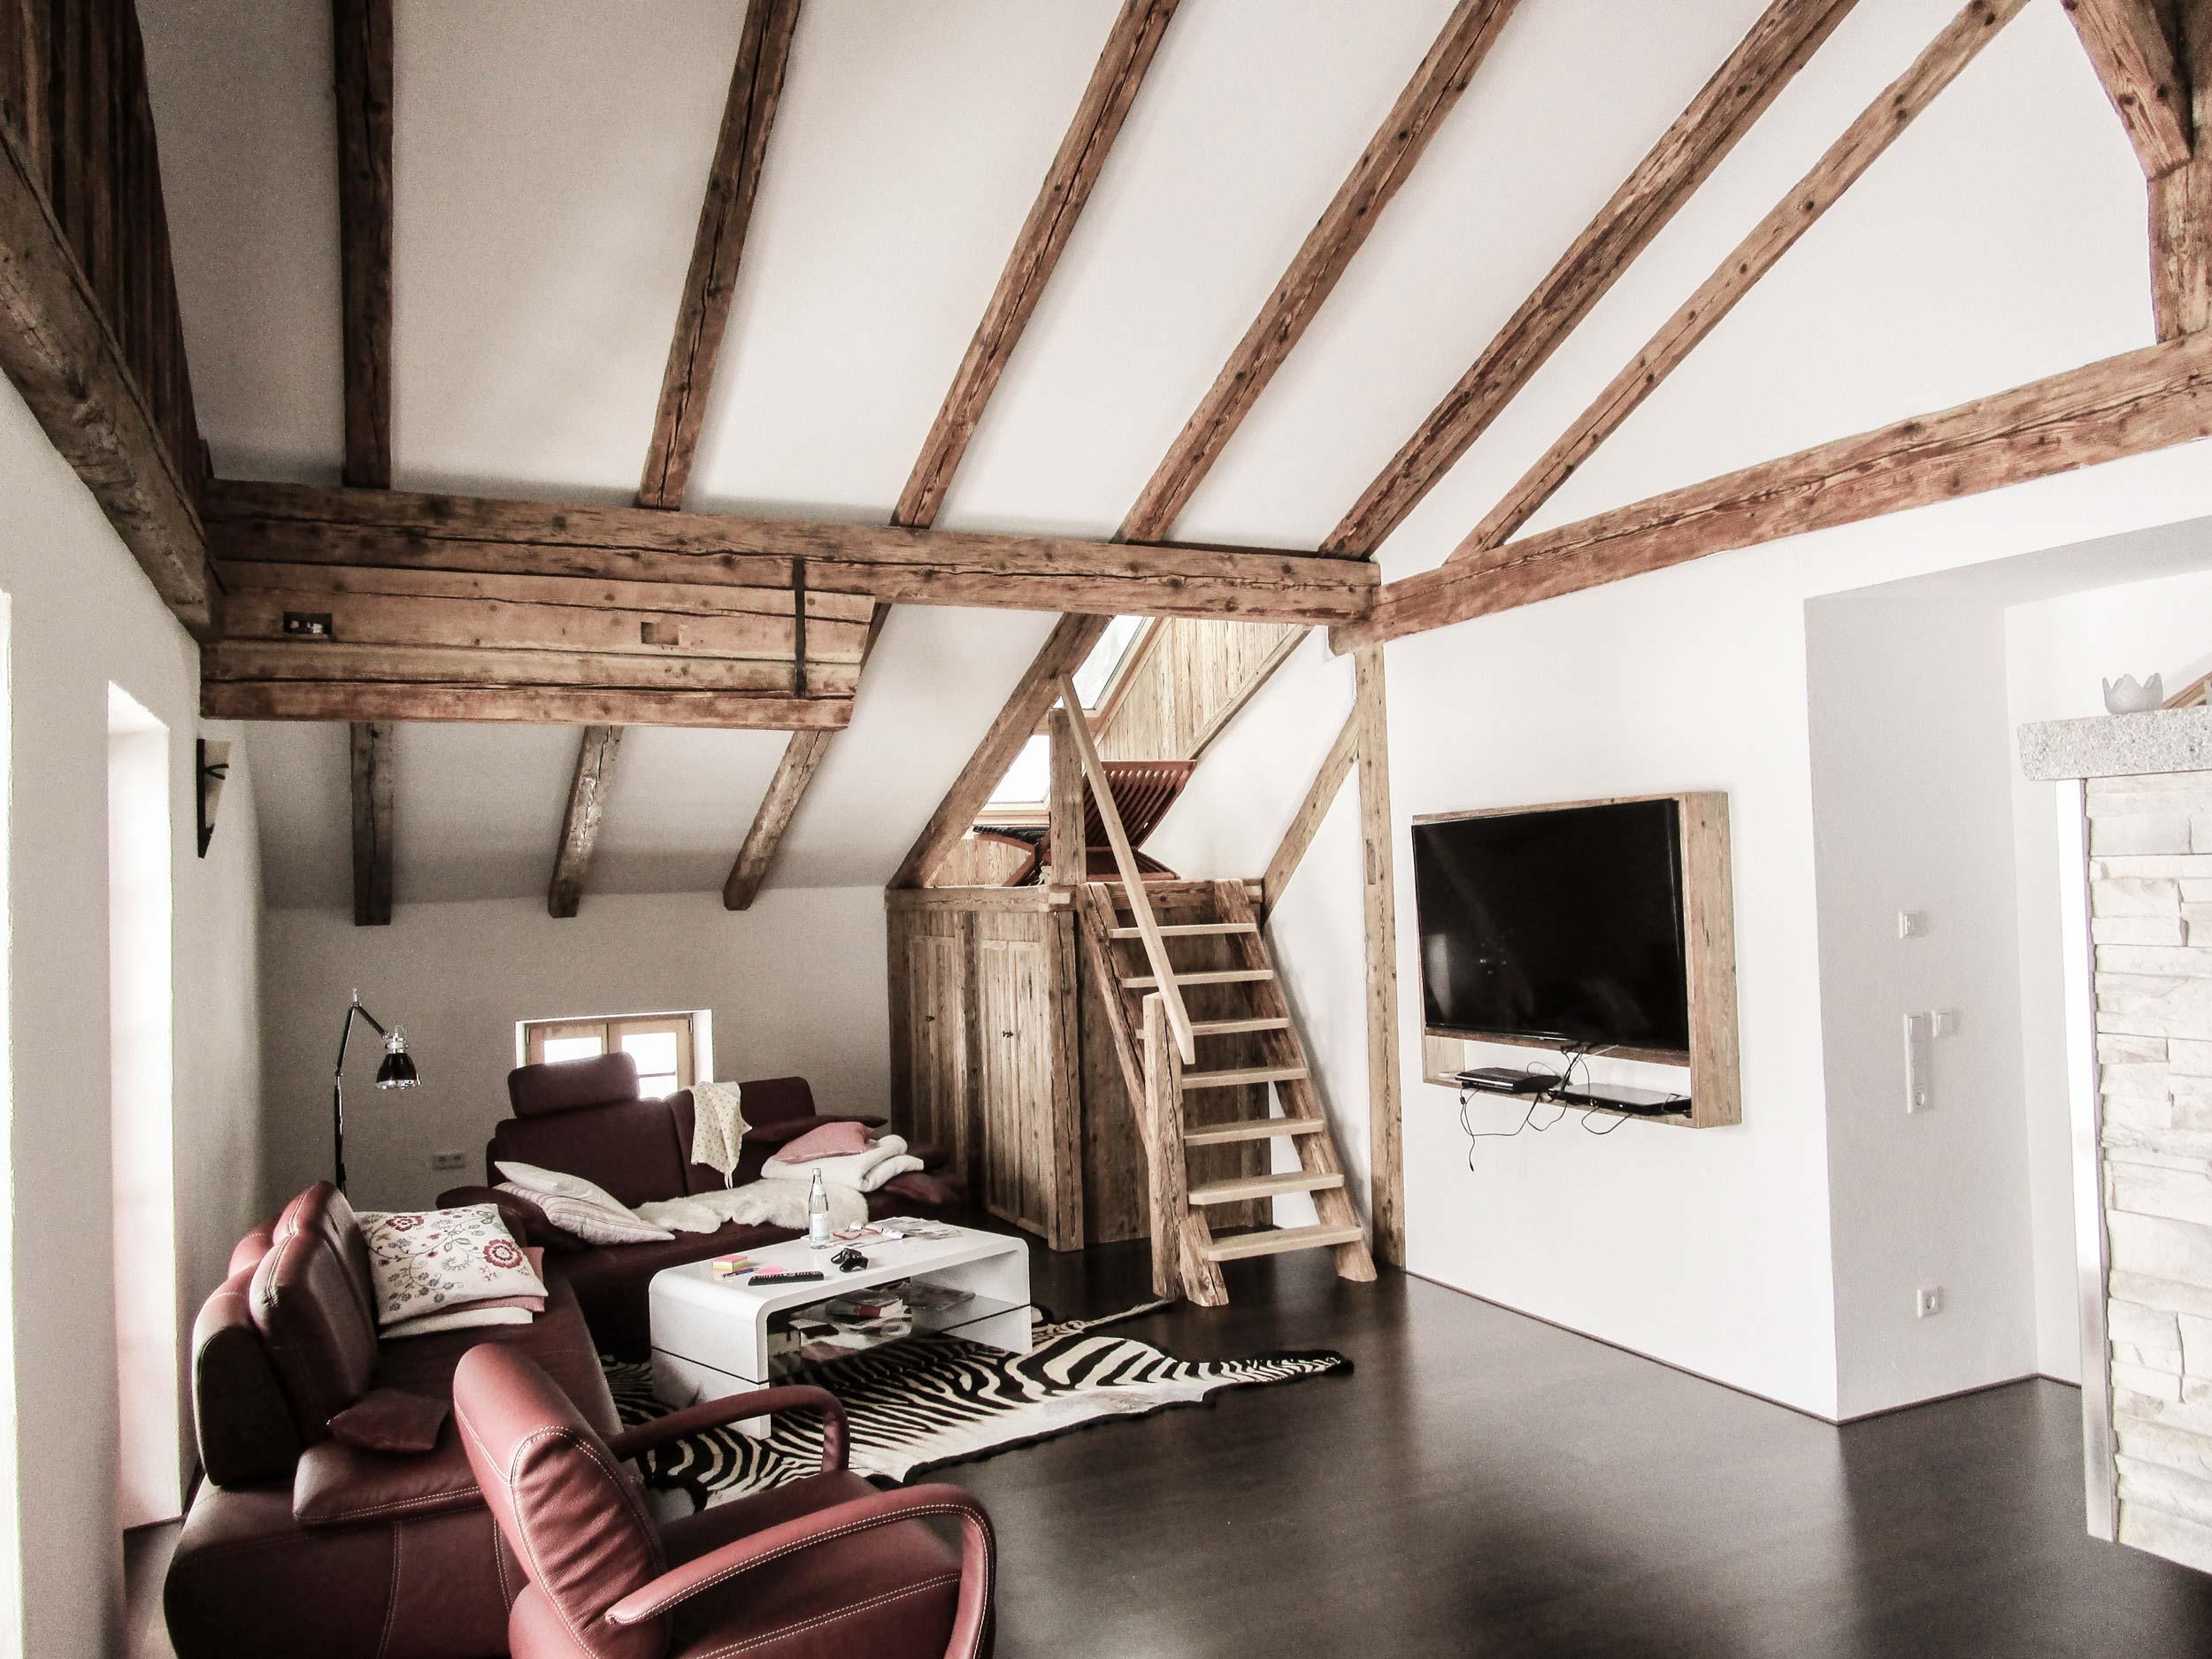 zimmerei-stoib-holzbau-holzhaus-innenausbau-altholz-treppe-dachstuhl-dachgeschoss-02.jpg